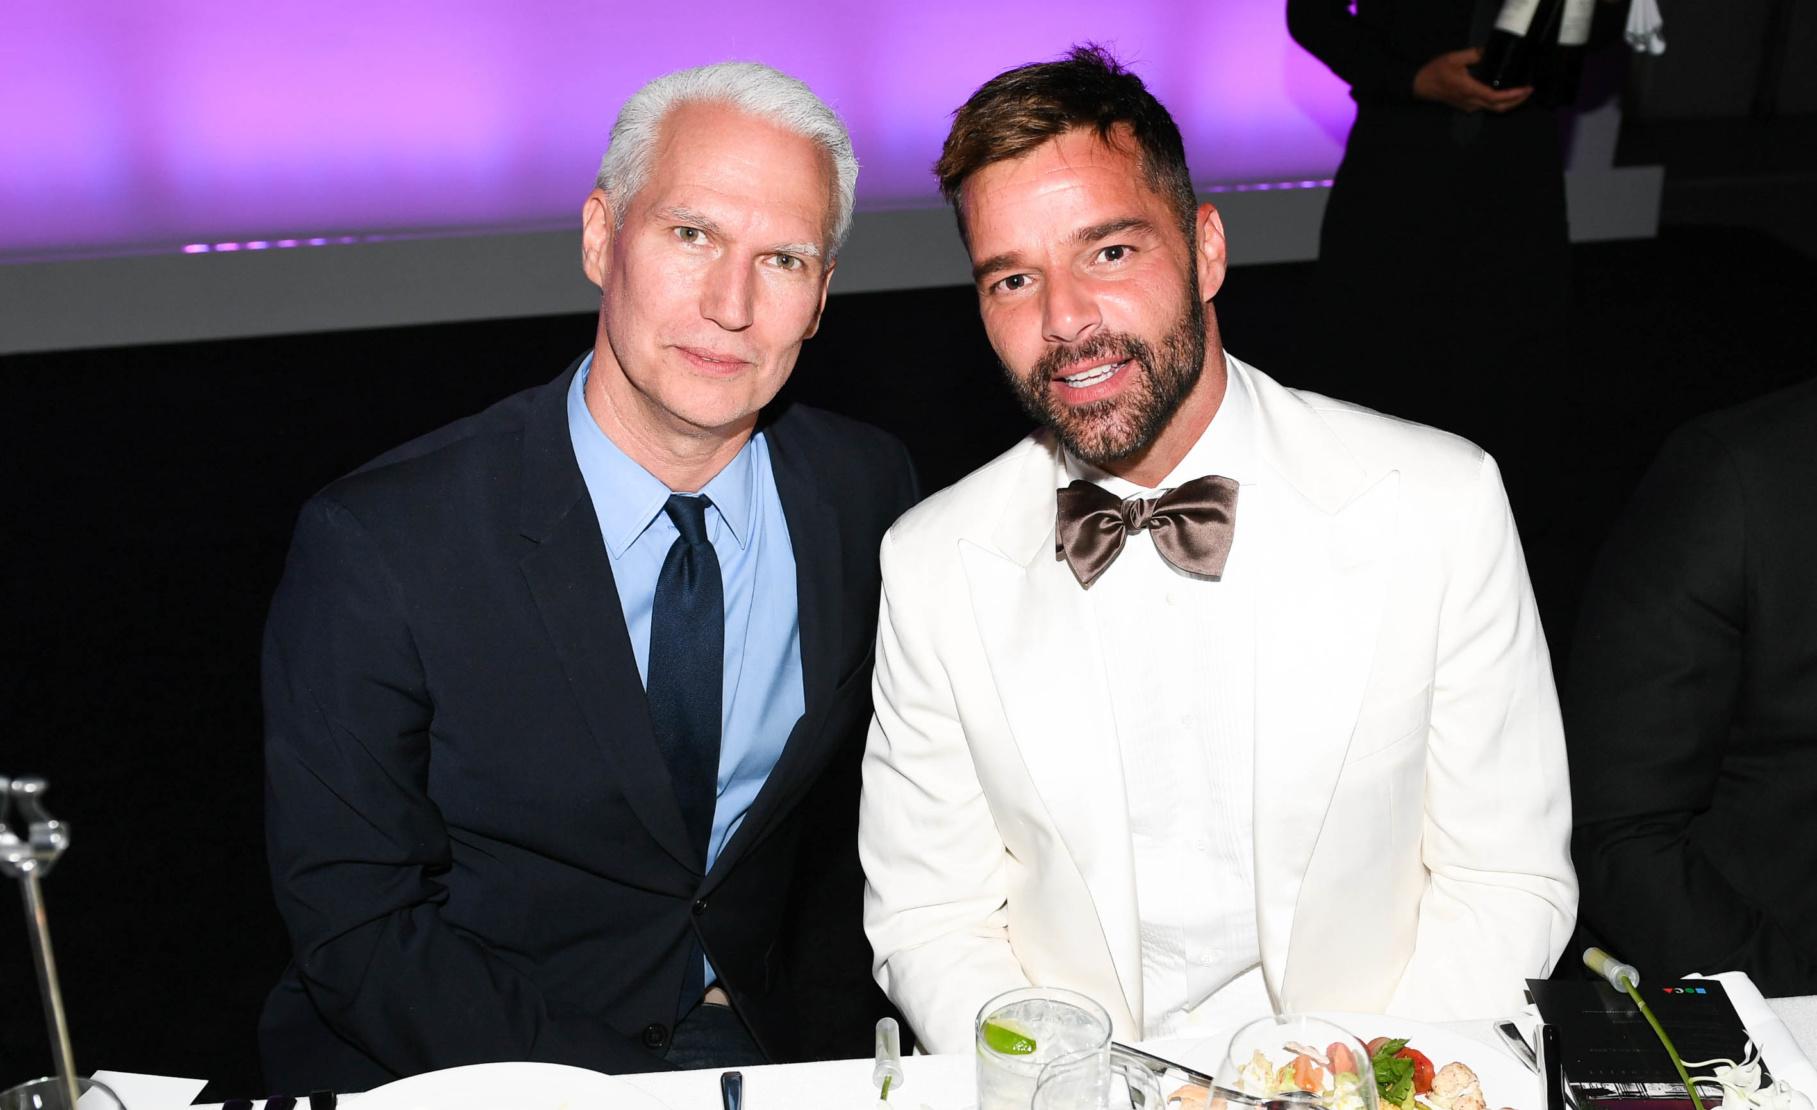 Klaus Biesenbach and Ricky Martin